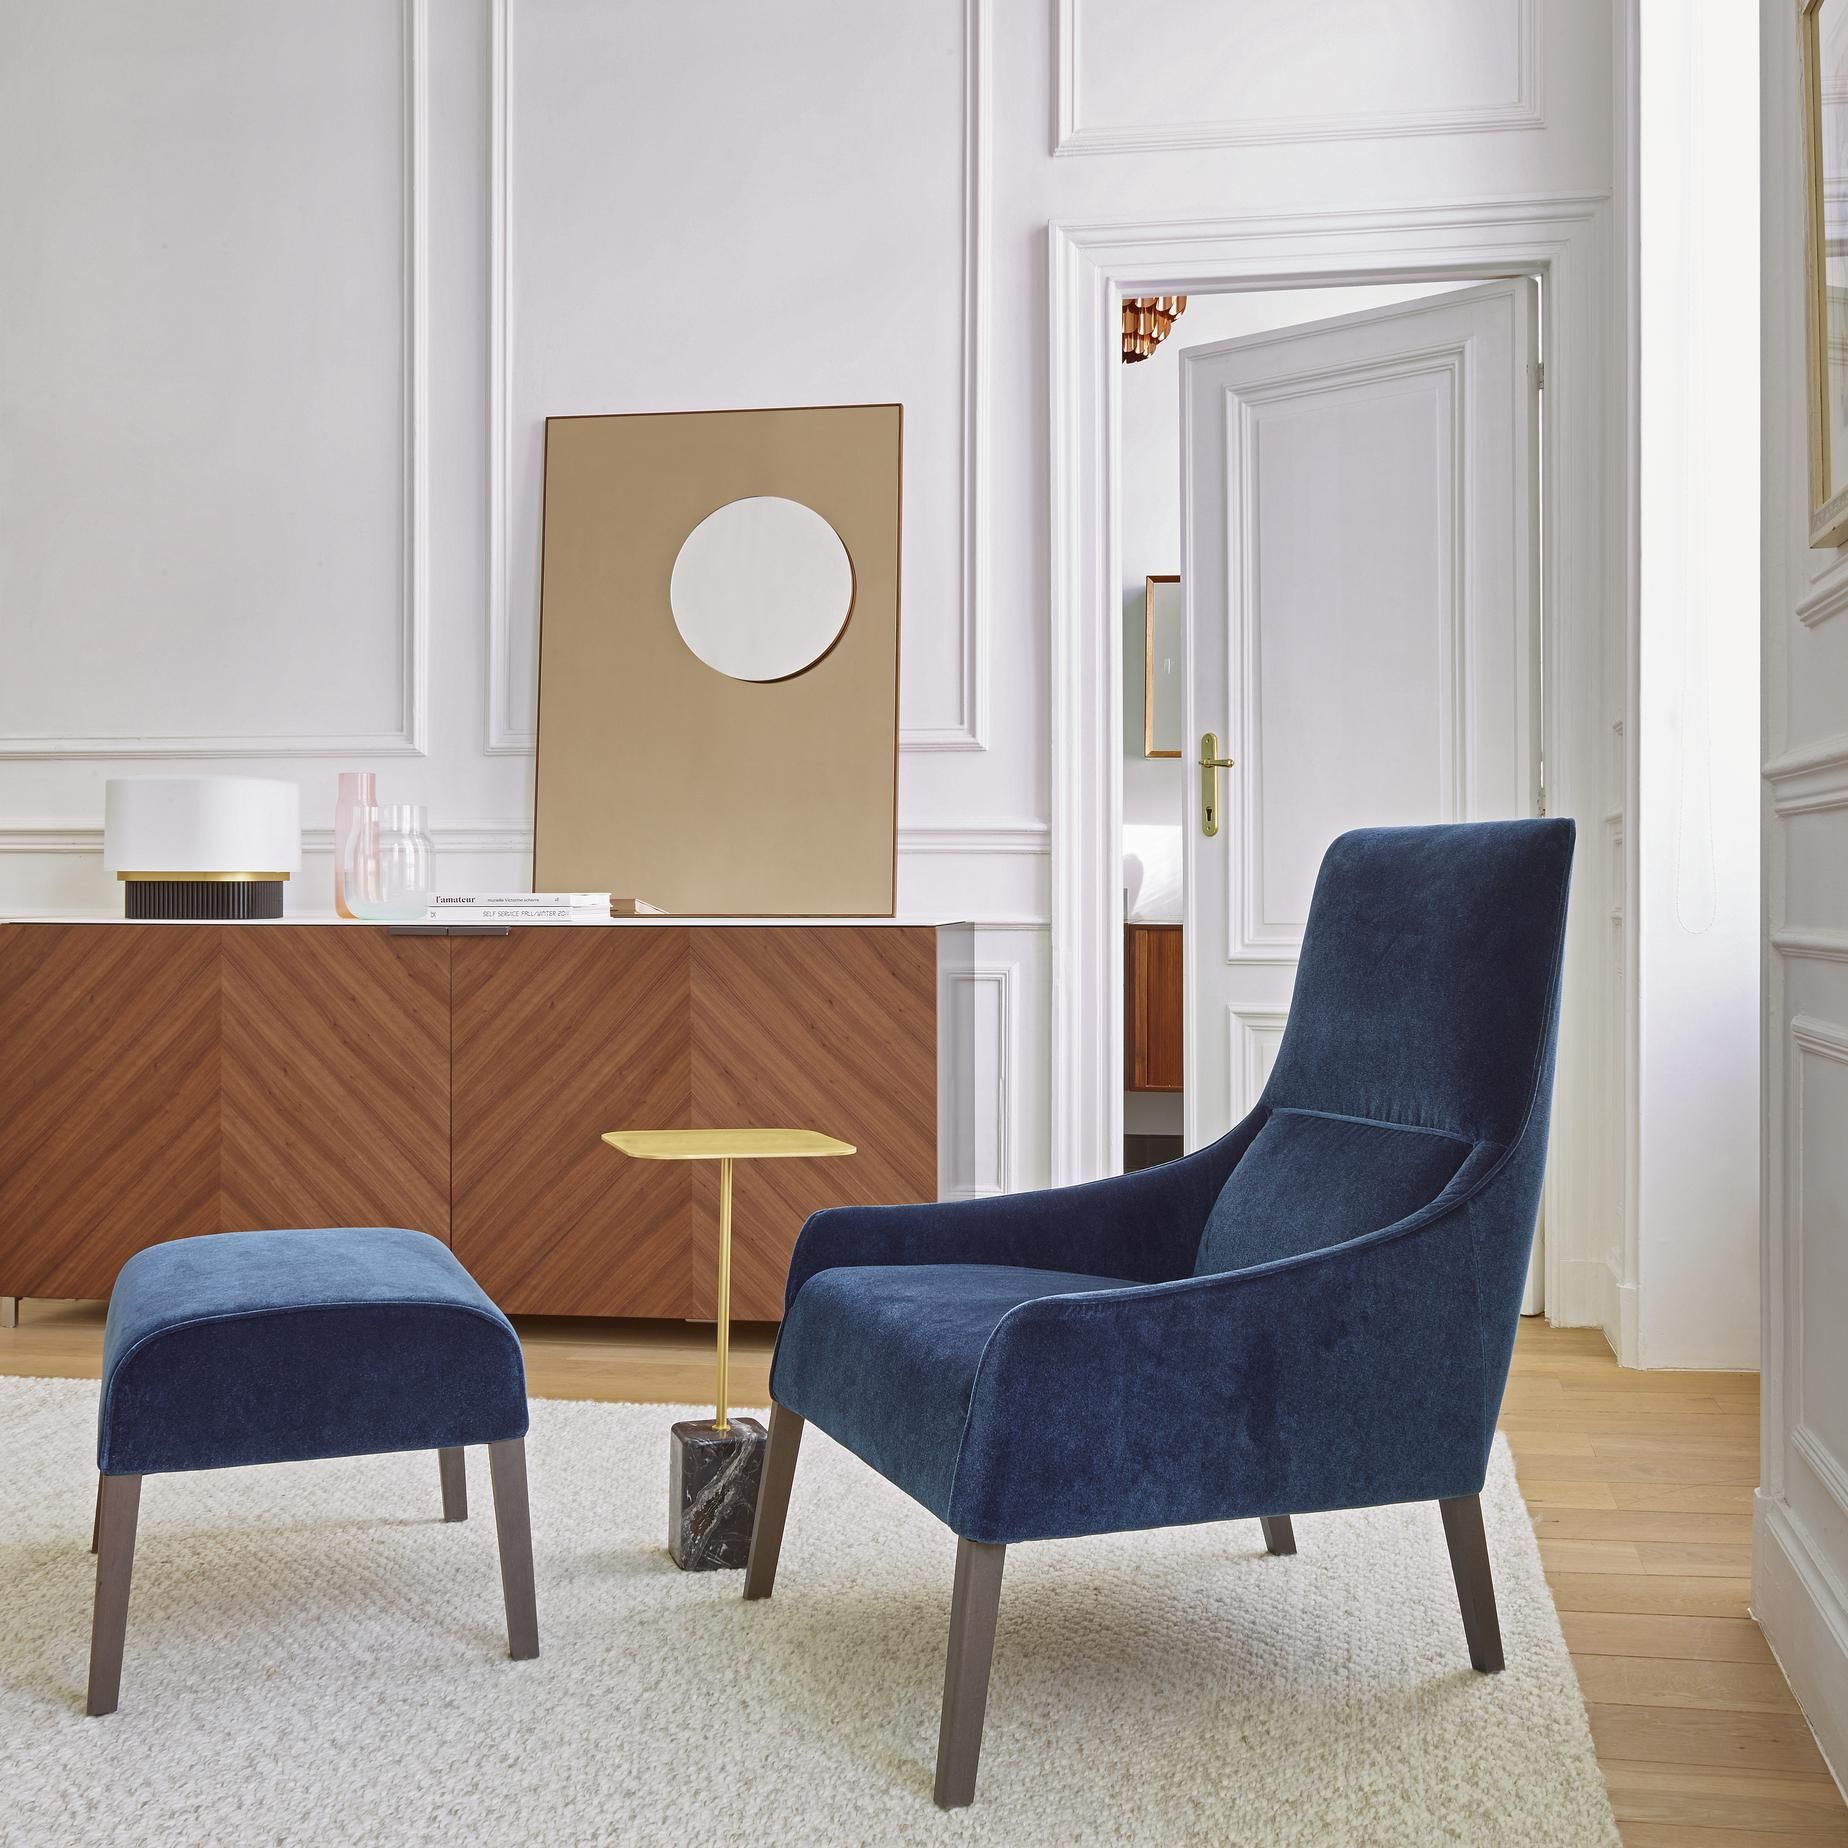 cupidon, occasional tables designer : noé duchaufour-lawrance, Wohnzimmer dekoo